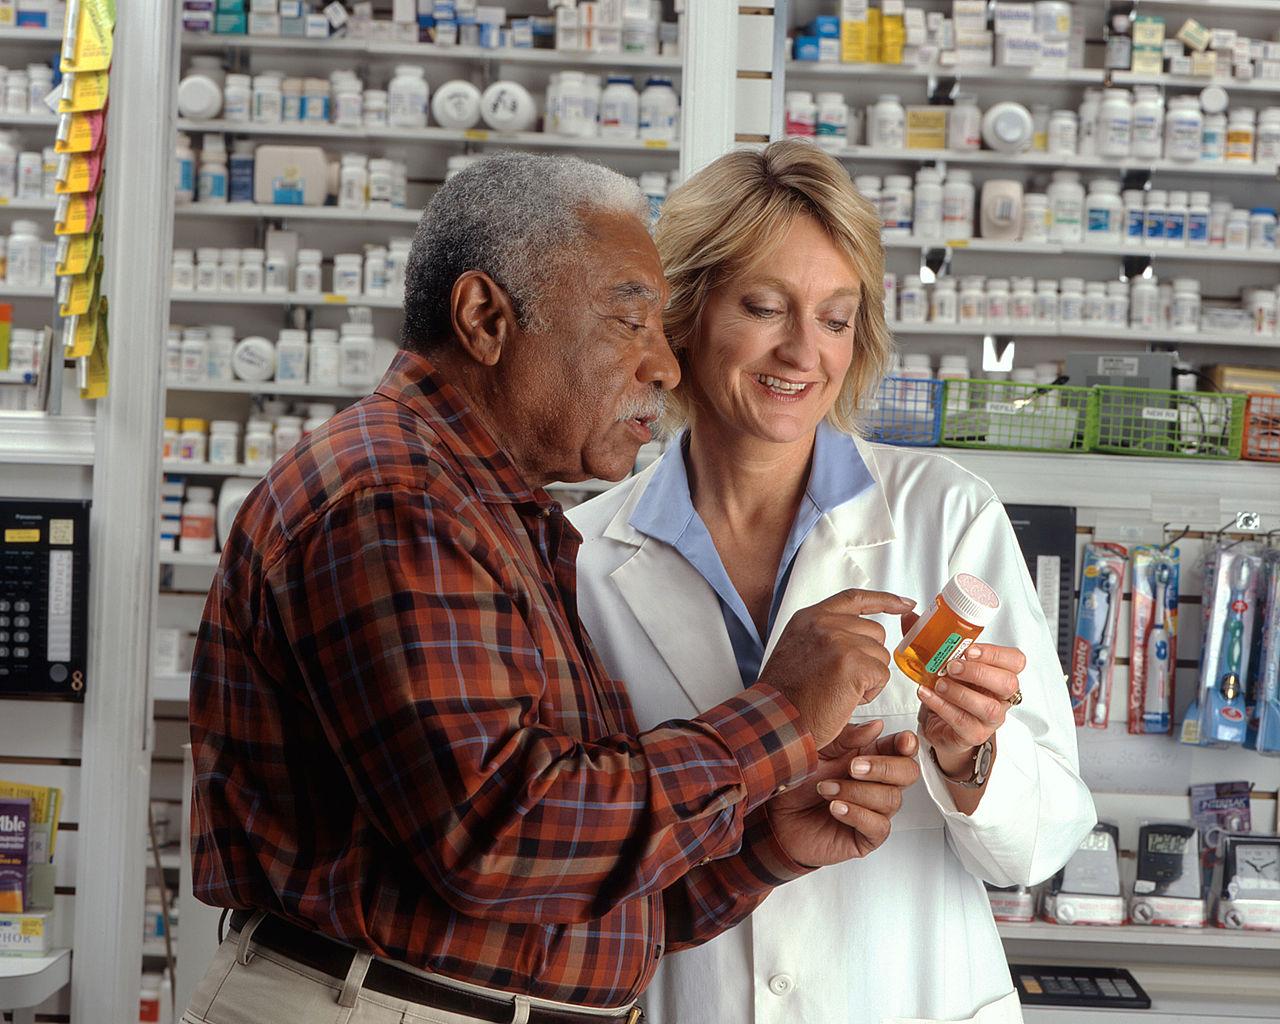 santé - pharmacien